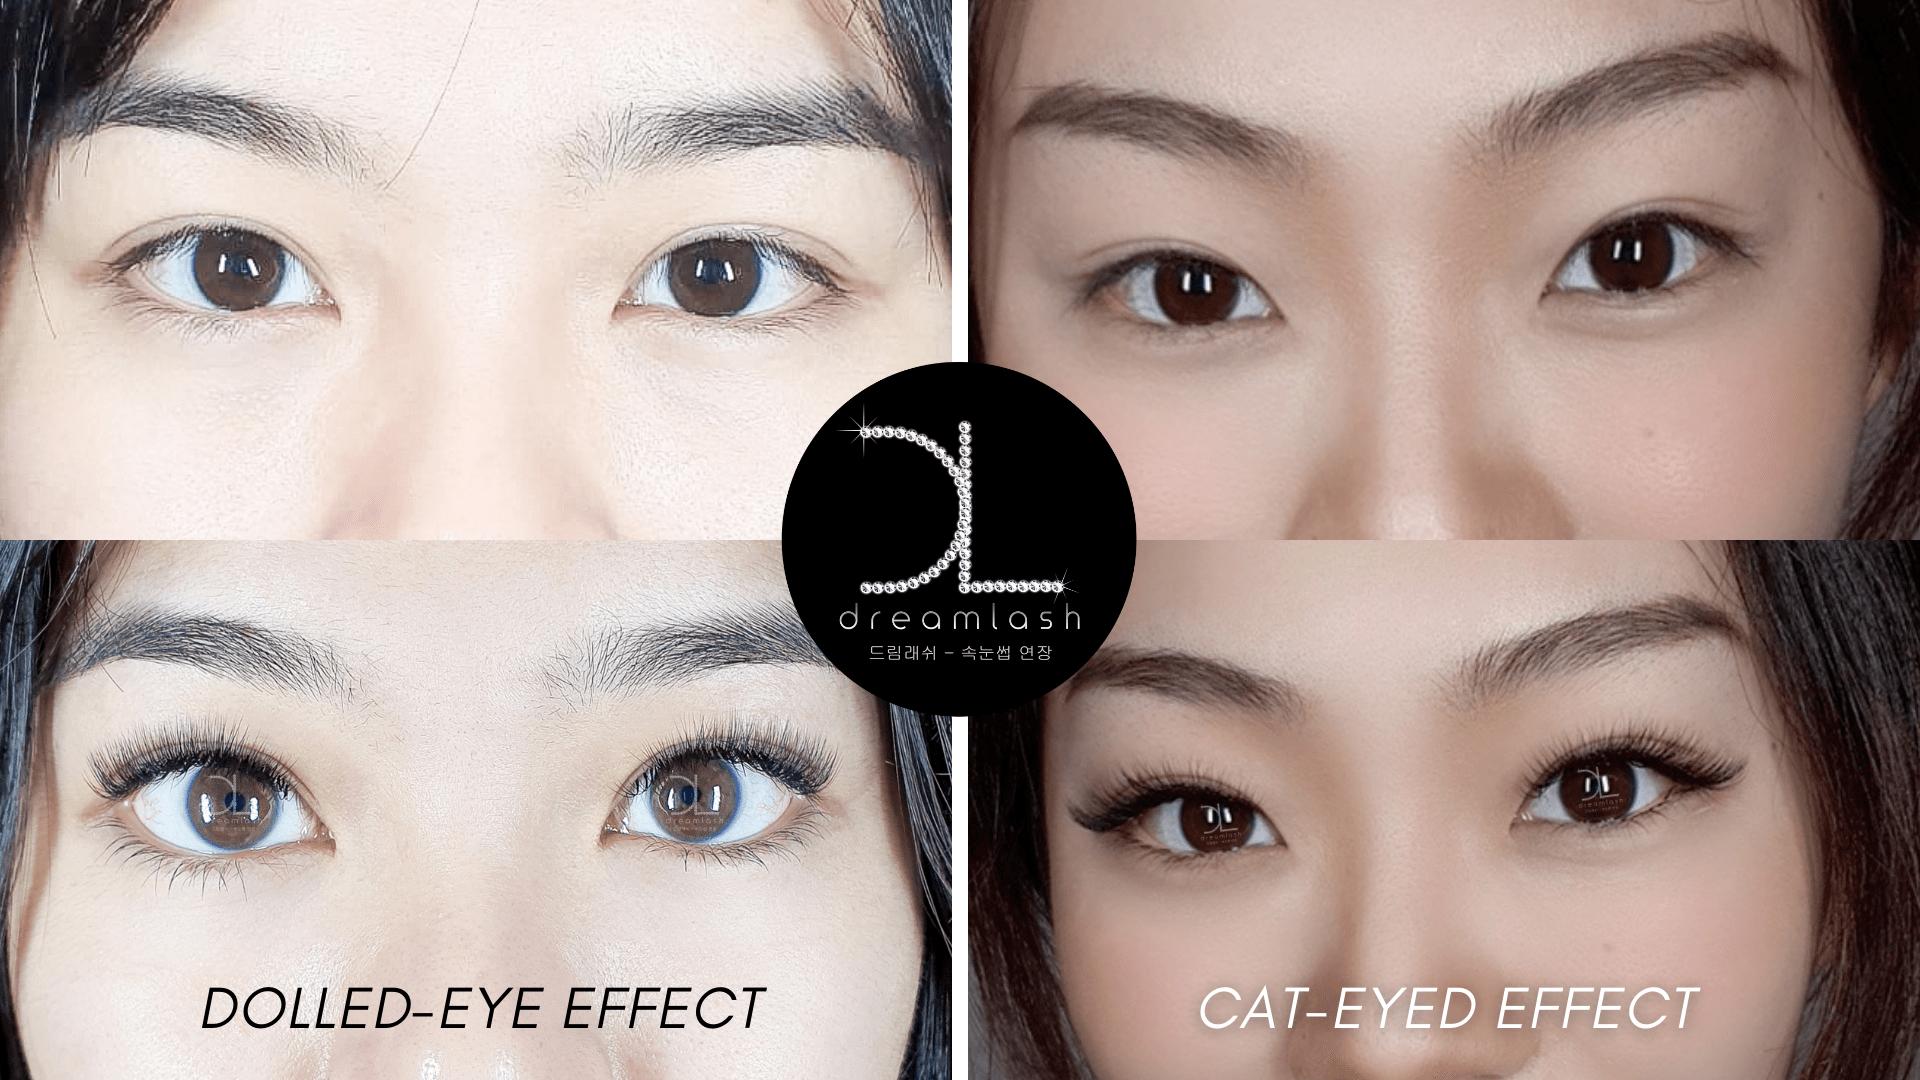 Dolled Eye Effect Eyelash vs Cat Eyed Effect Eyelash